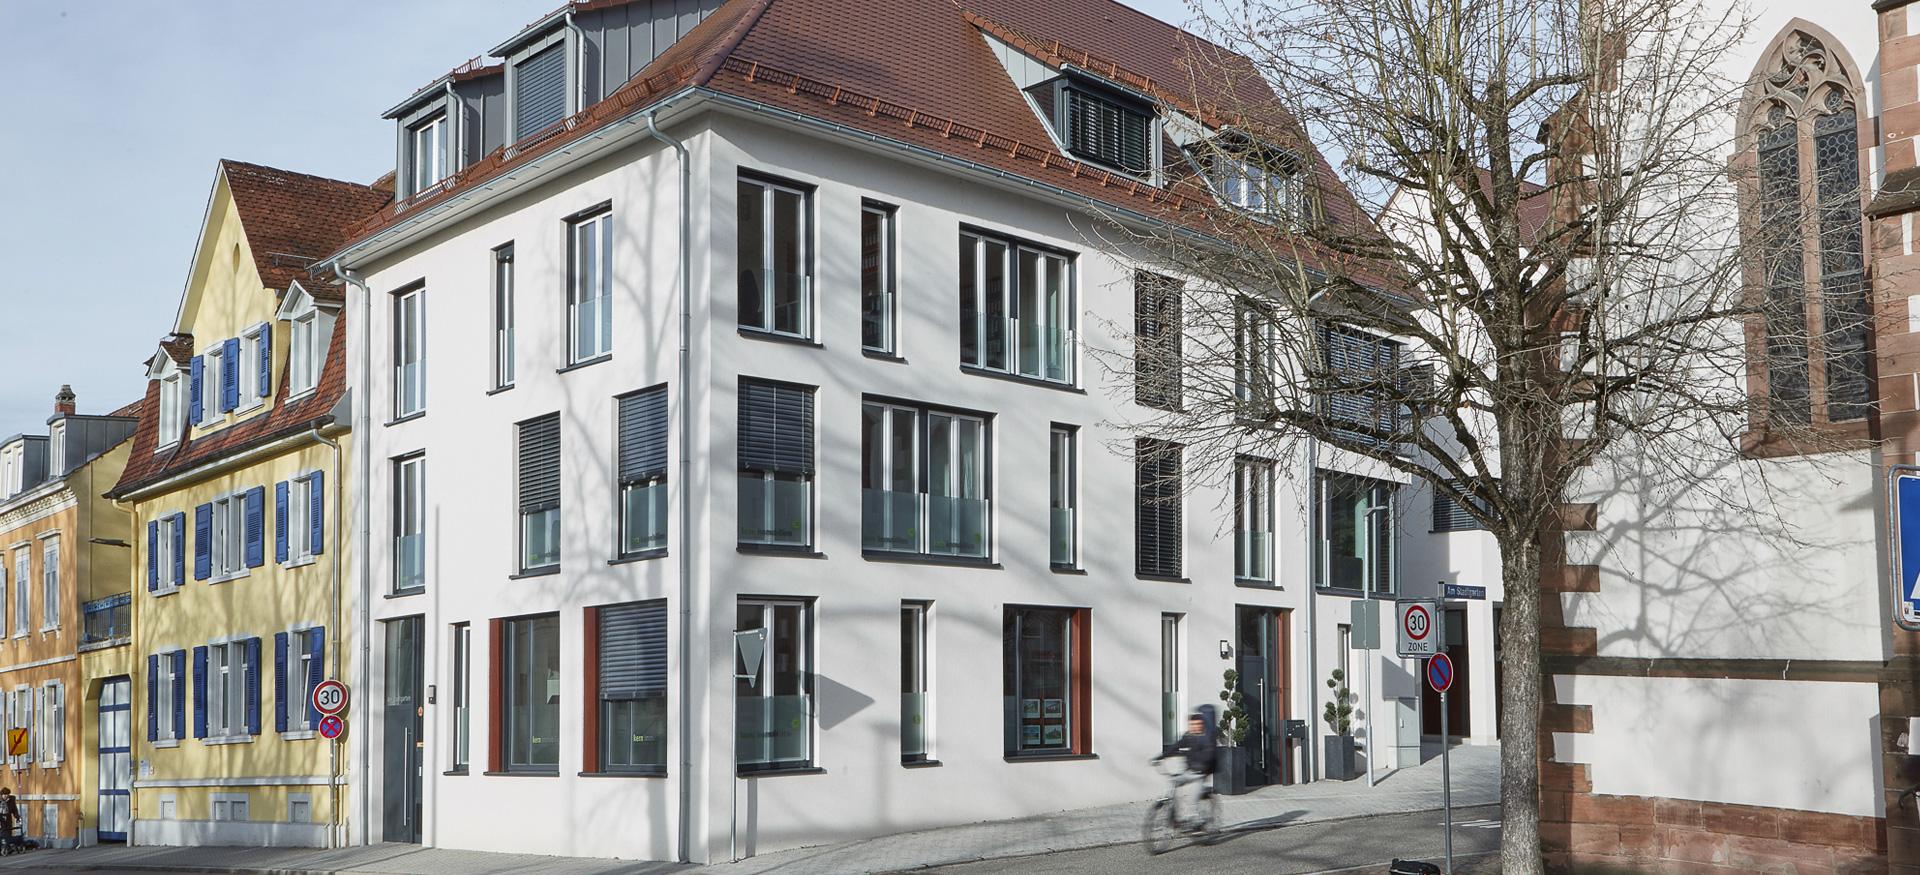 Immobilienangebote Emmendingen Haus mieten Hauskauf